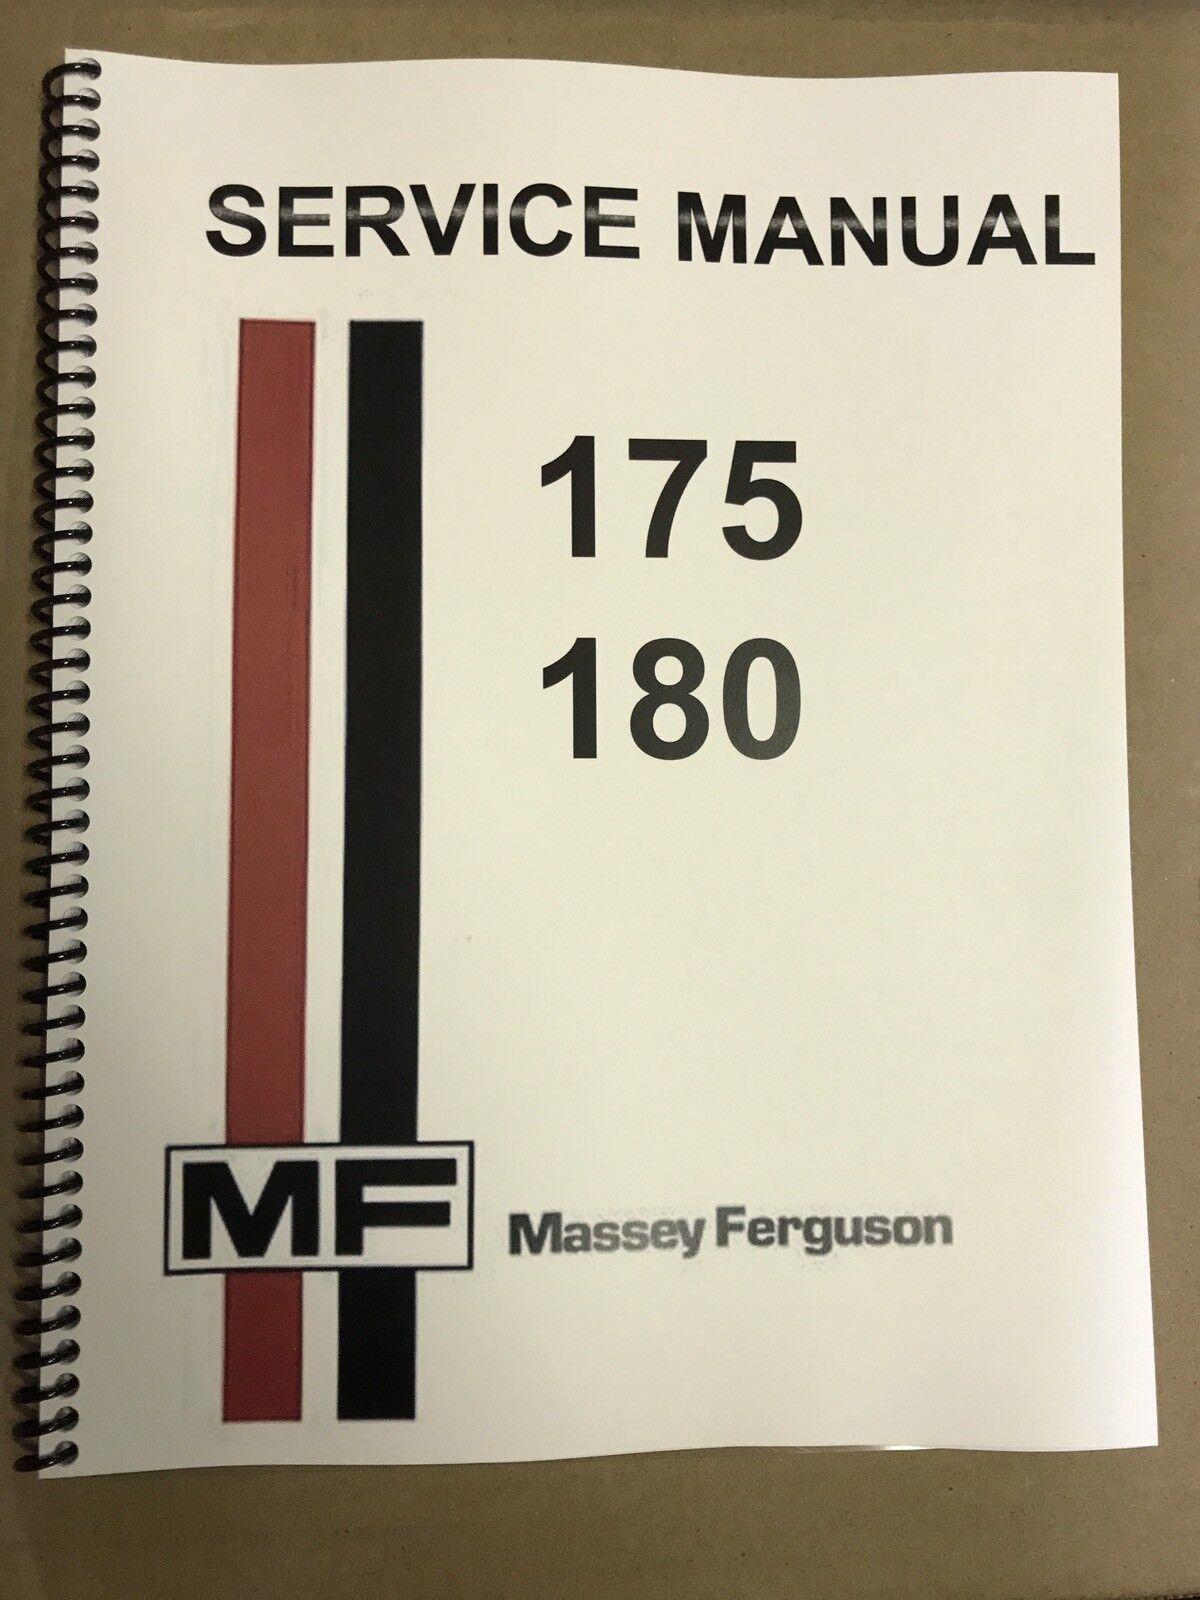 massey ferguson 180 tractor service repair shop manual technical rh ebay com MF 175 Tractor massey ferguson 175 parts manual